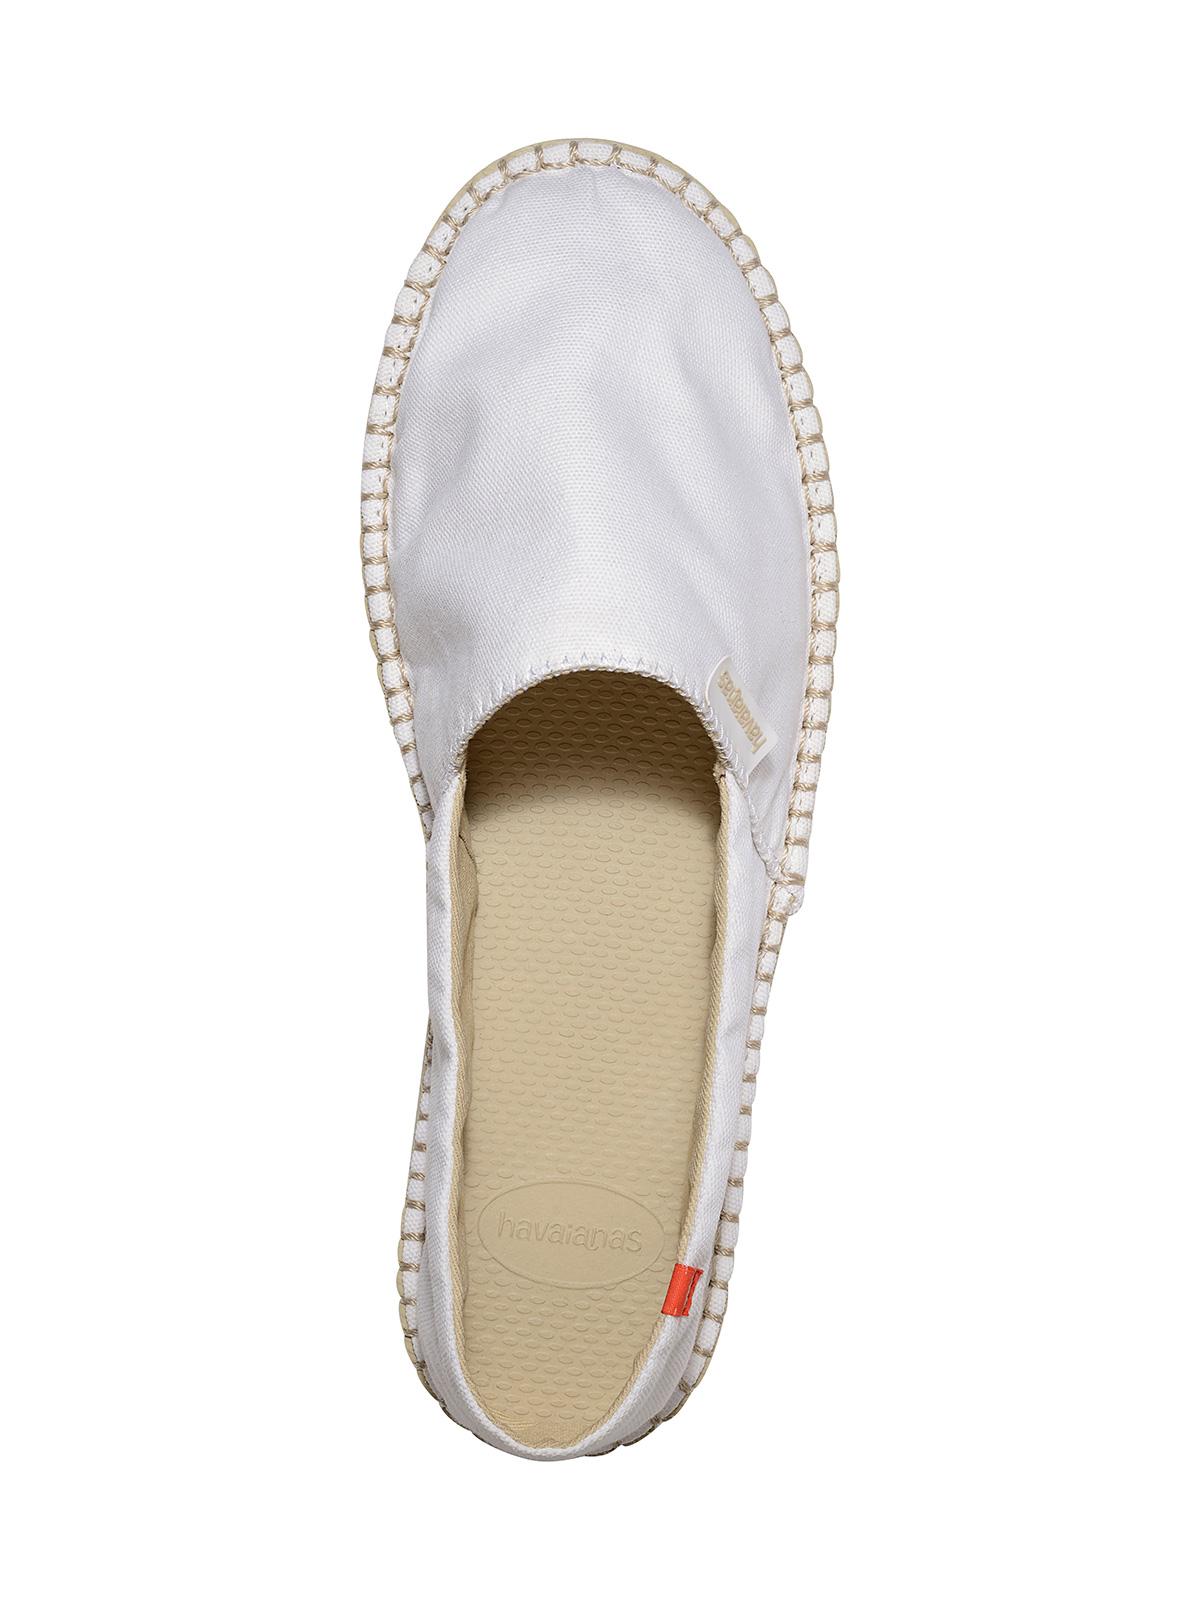 Alpargatas blancas de tela, con suela en beige , Origine II White